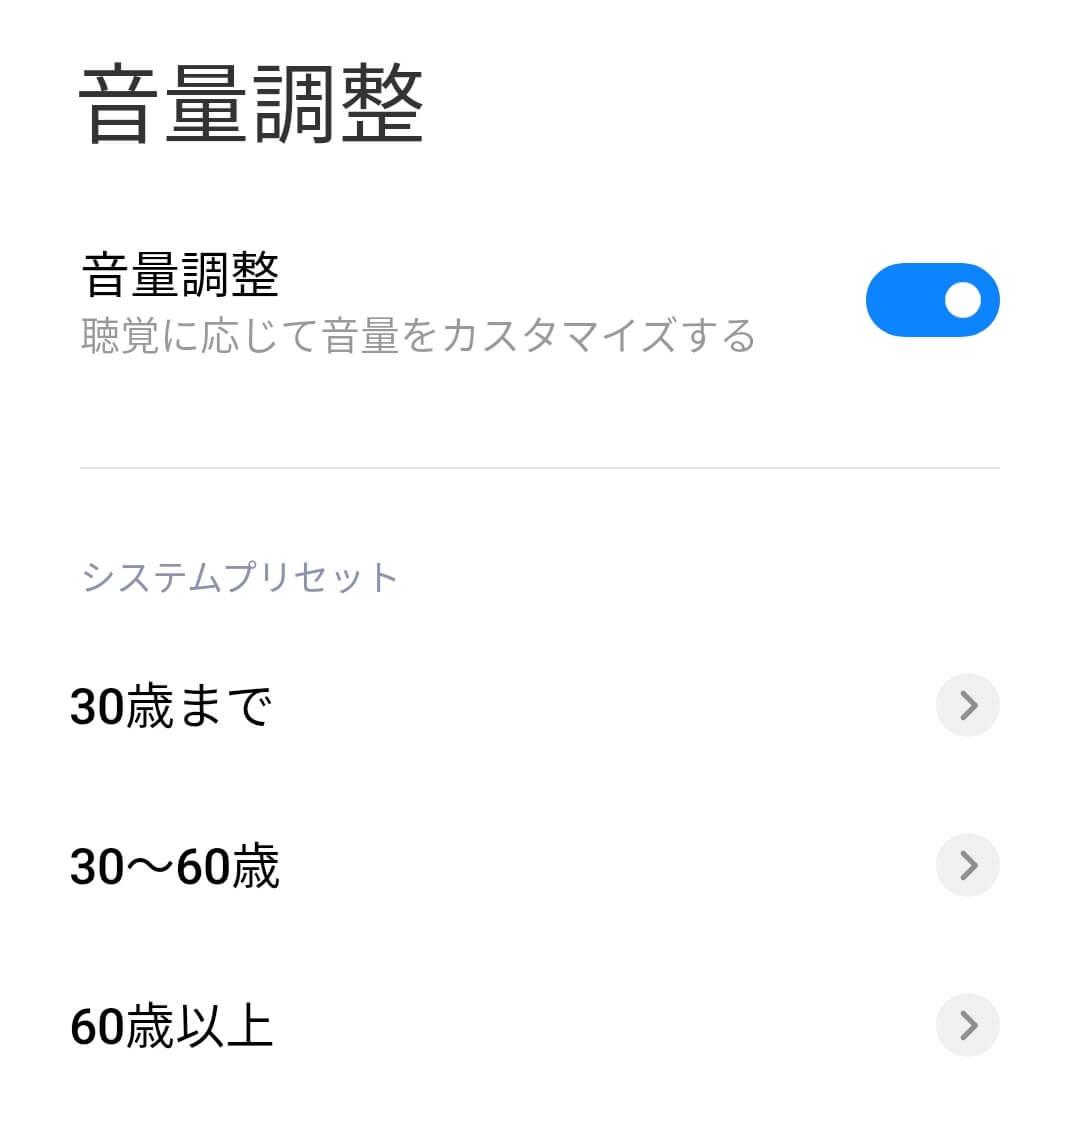 Redmi Note 10 Proの音量調整項目から年齢を設定